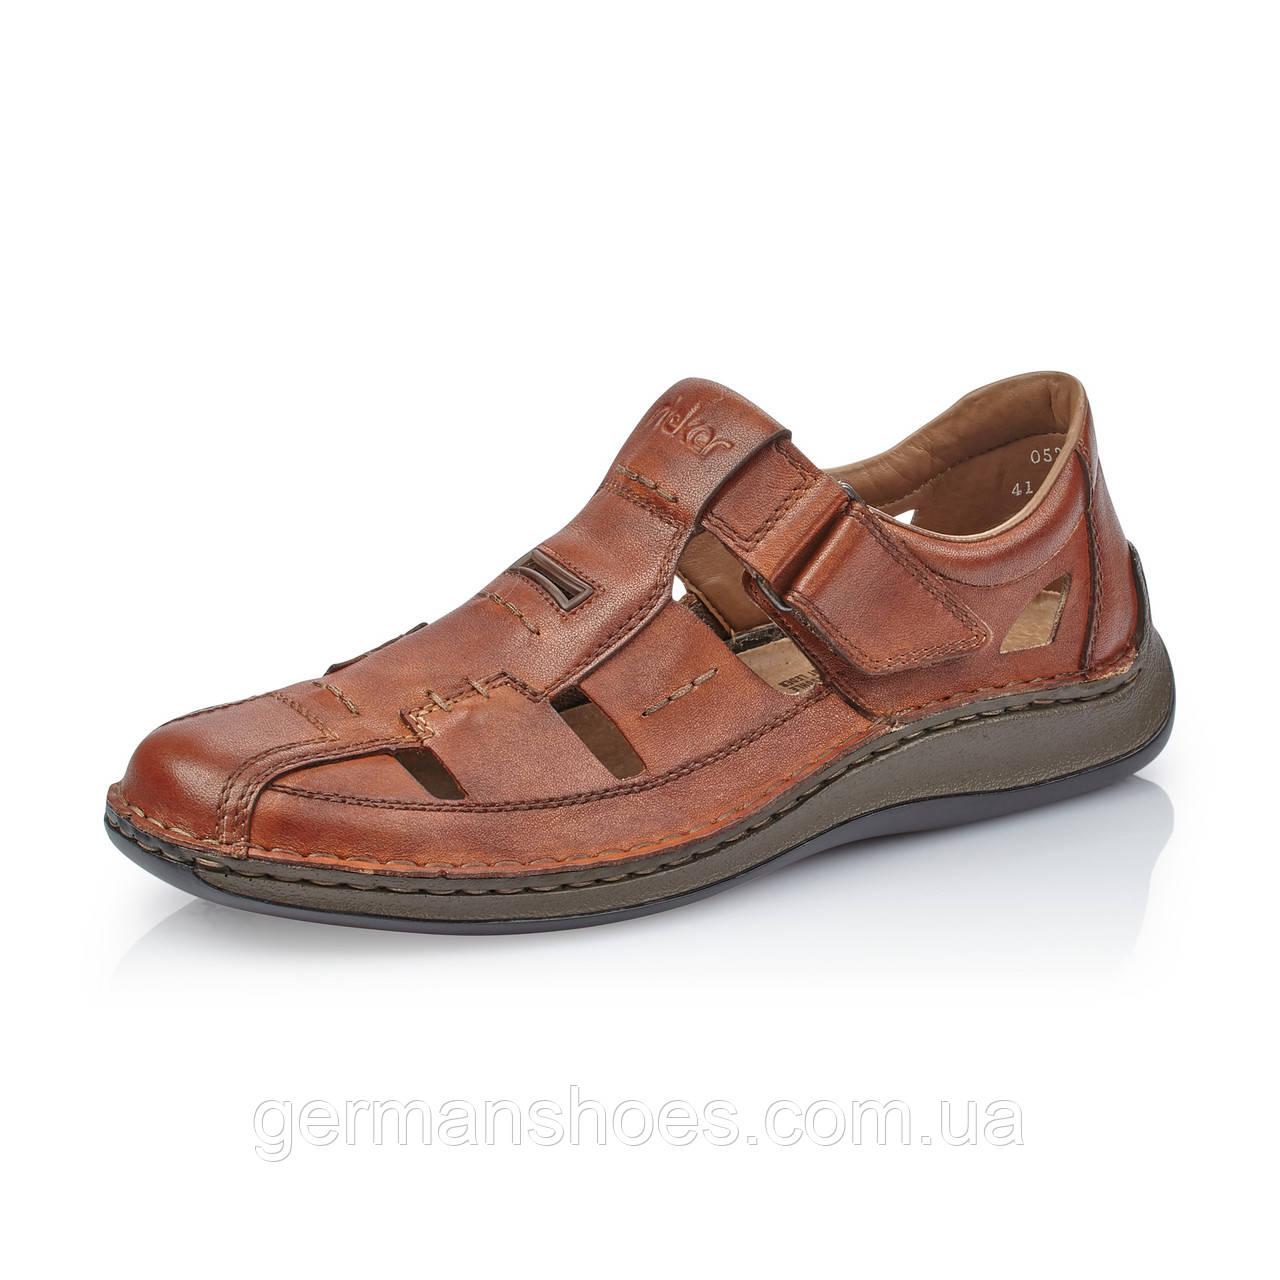 8585a6ad Туфли мужские Rieker 05284-24 - Интернет-магазин обуви